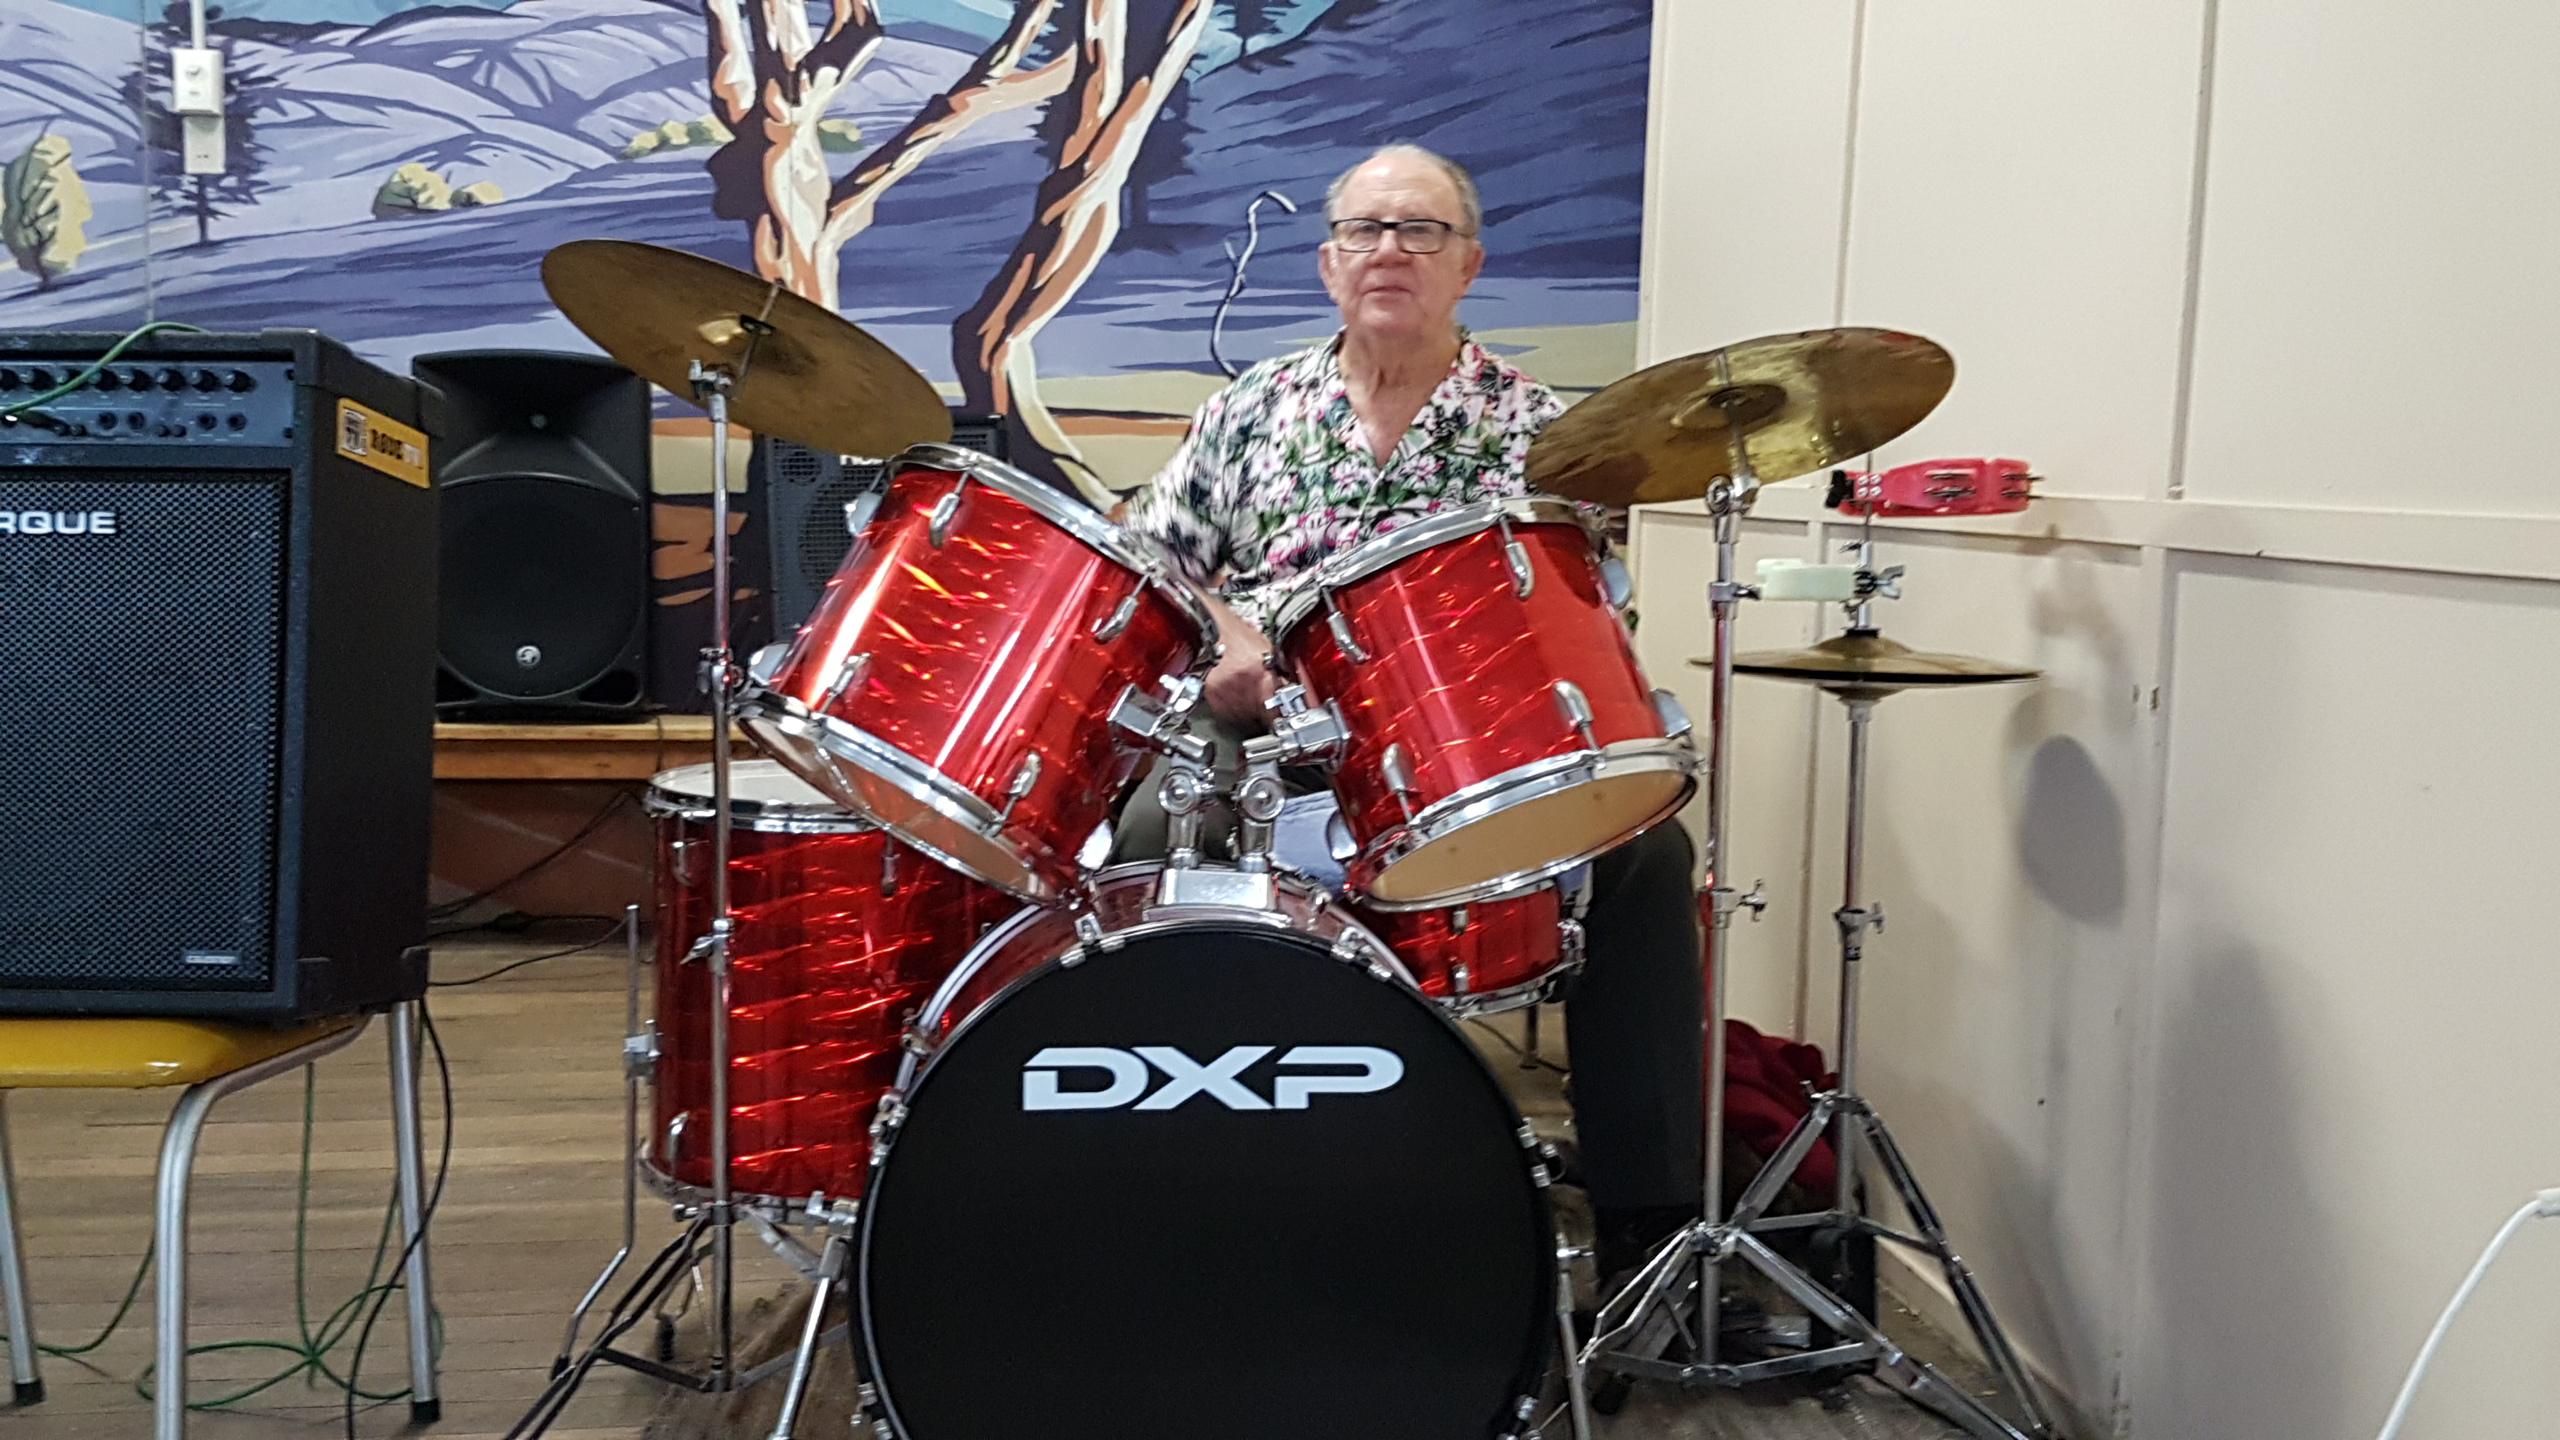 Evening Drummer